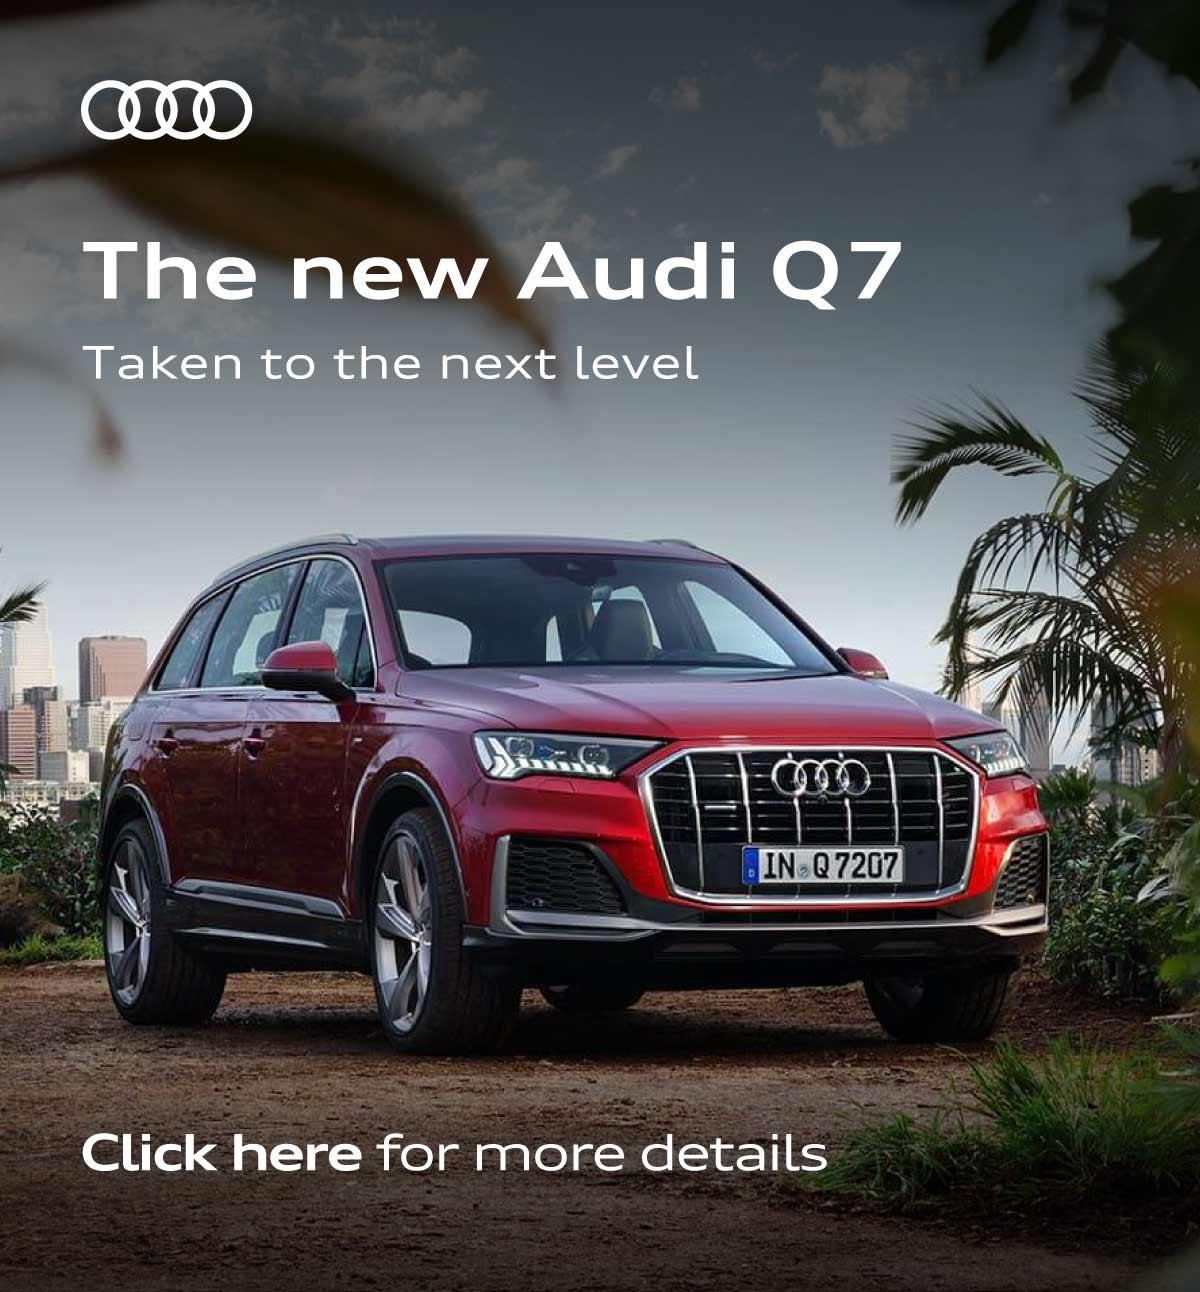 New Audi Q11 for Sale | Best New Audi Q11 Deals | Hereford Audi | audi new car deals